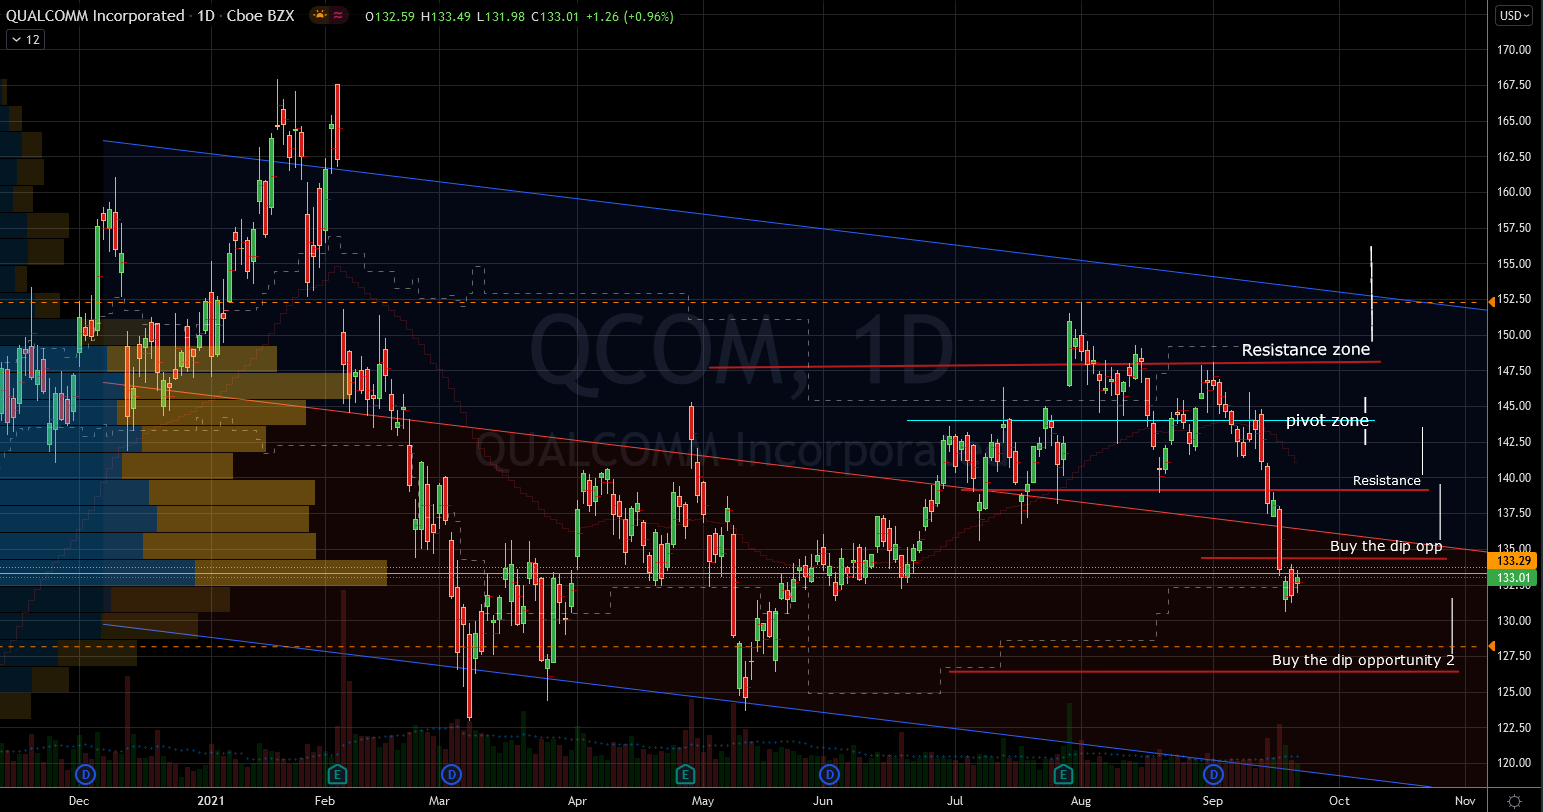 Stocks to Buy: Qualcomm (QCOM) Stock Chart Showing Base